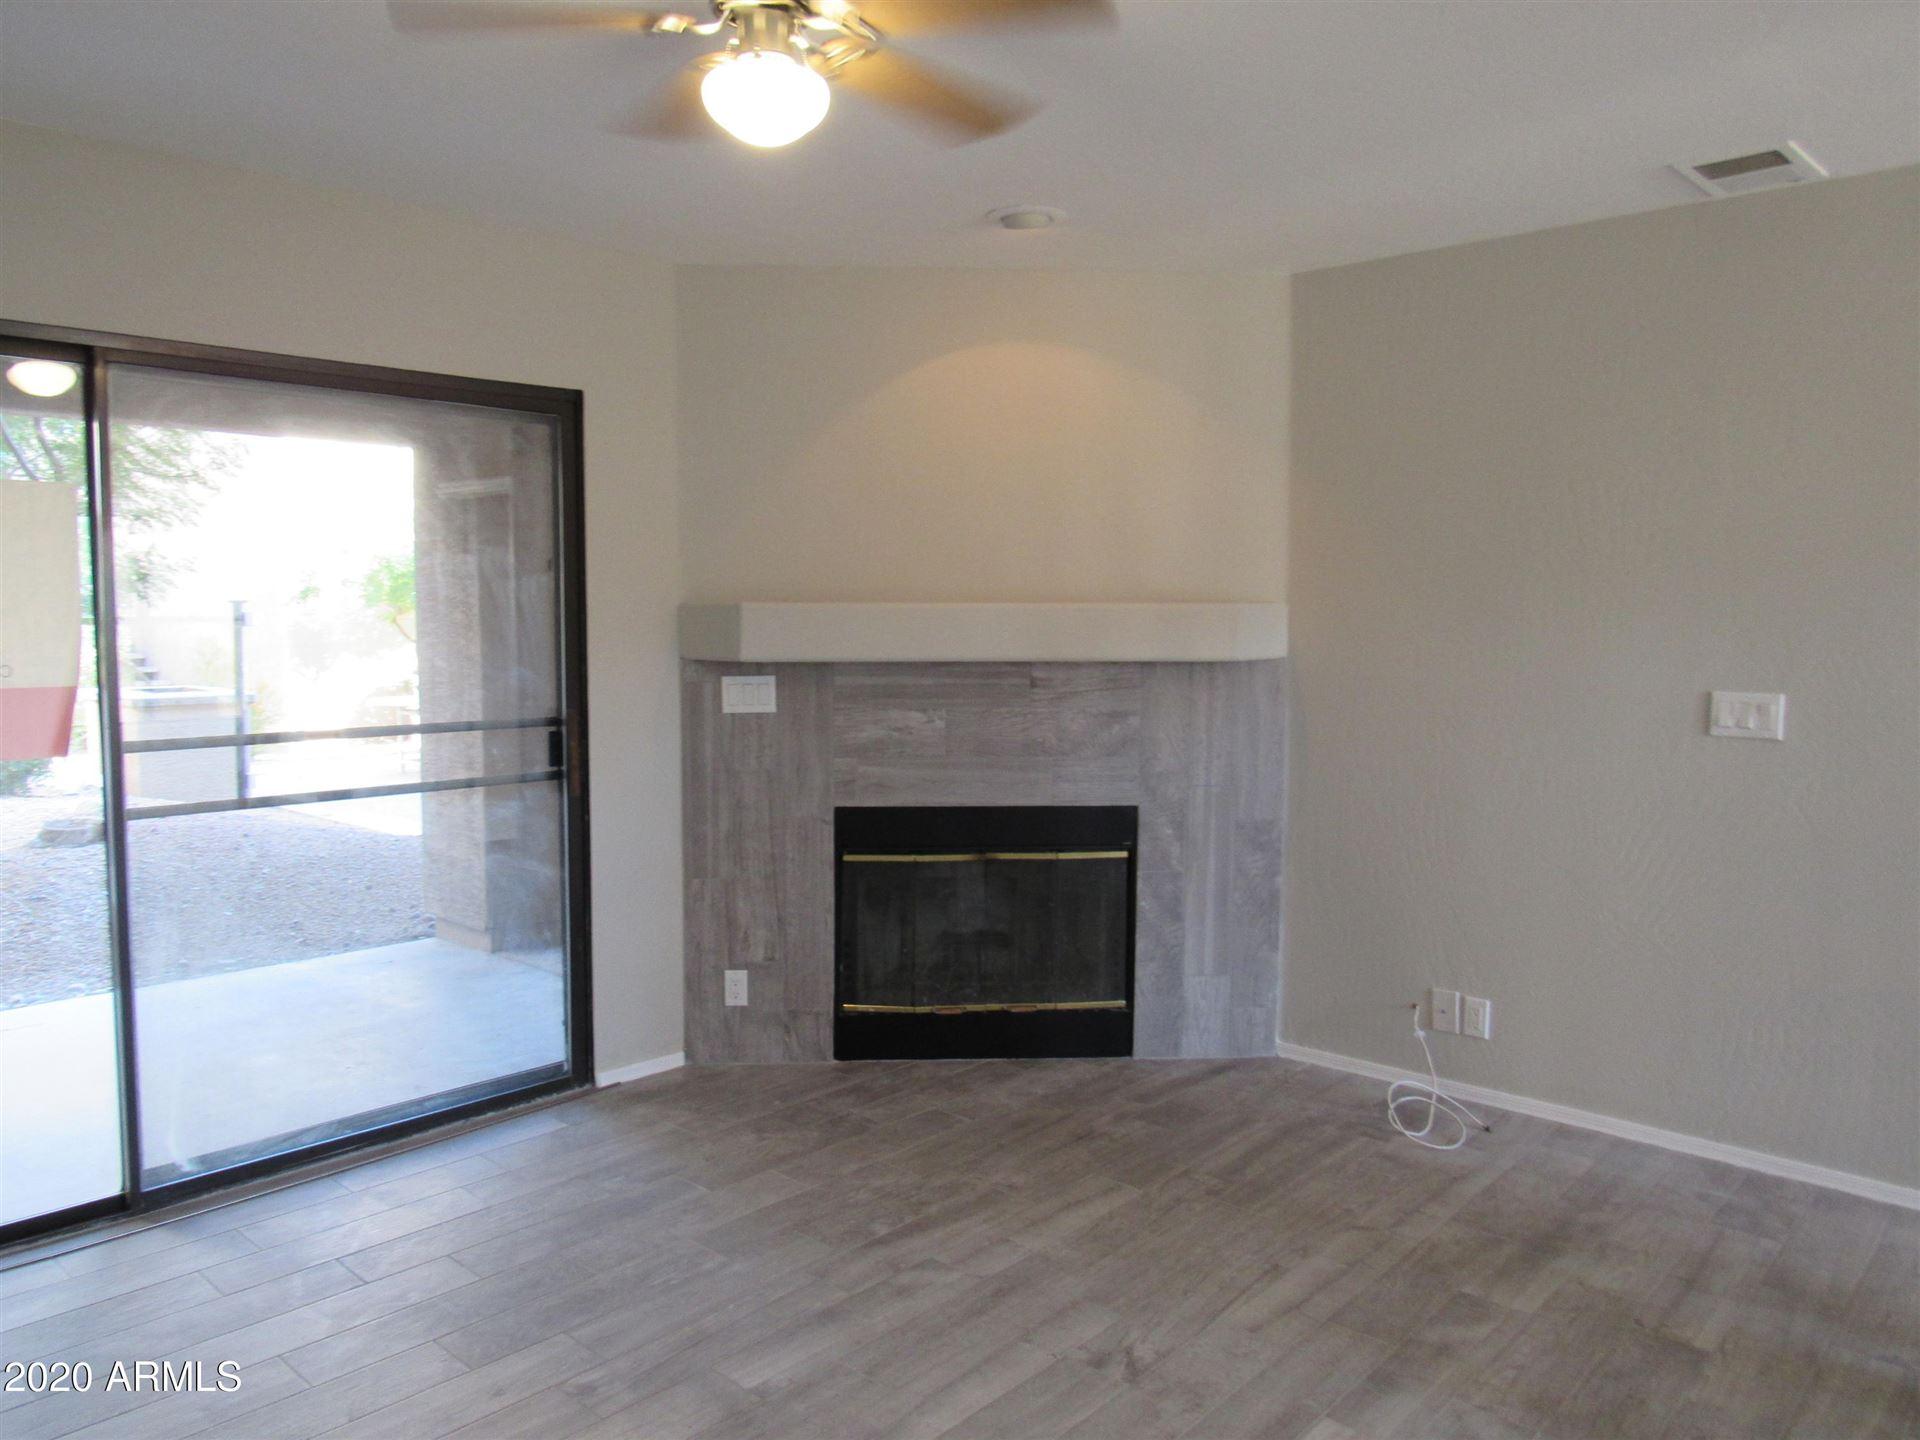 14910 N Kings Way #106, Fountain Hills, AZ 85268 - MLS#: 6174651